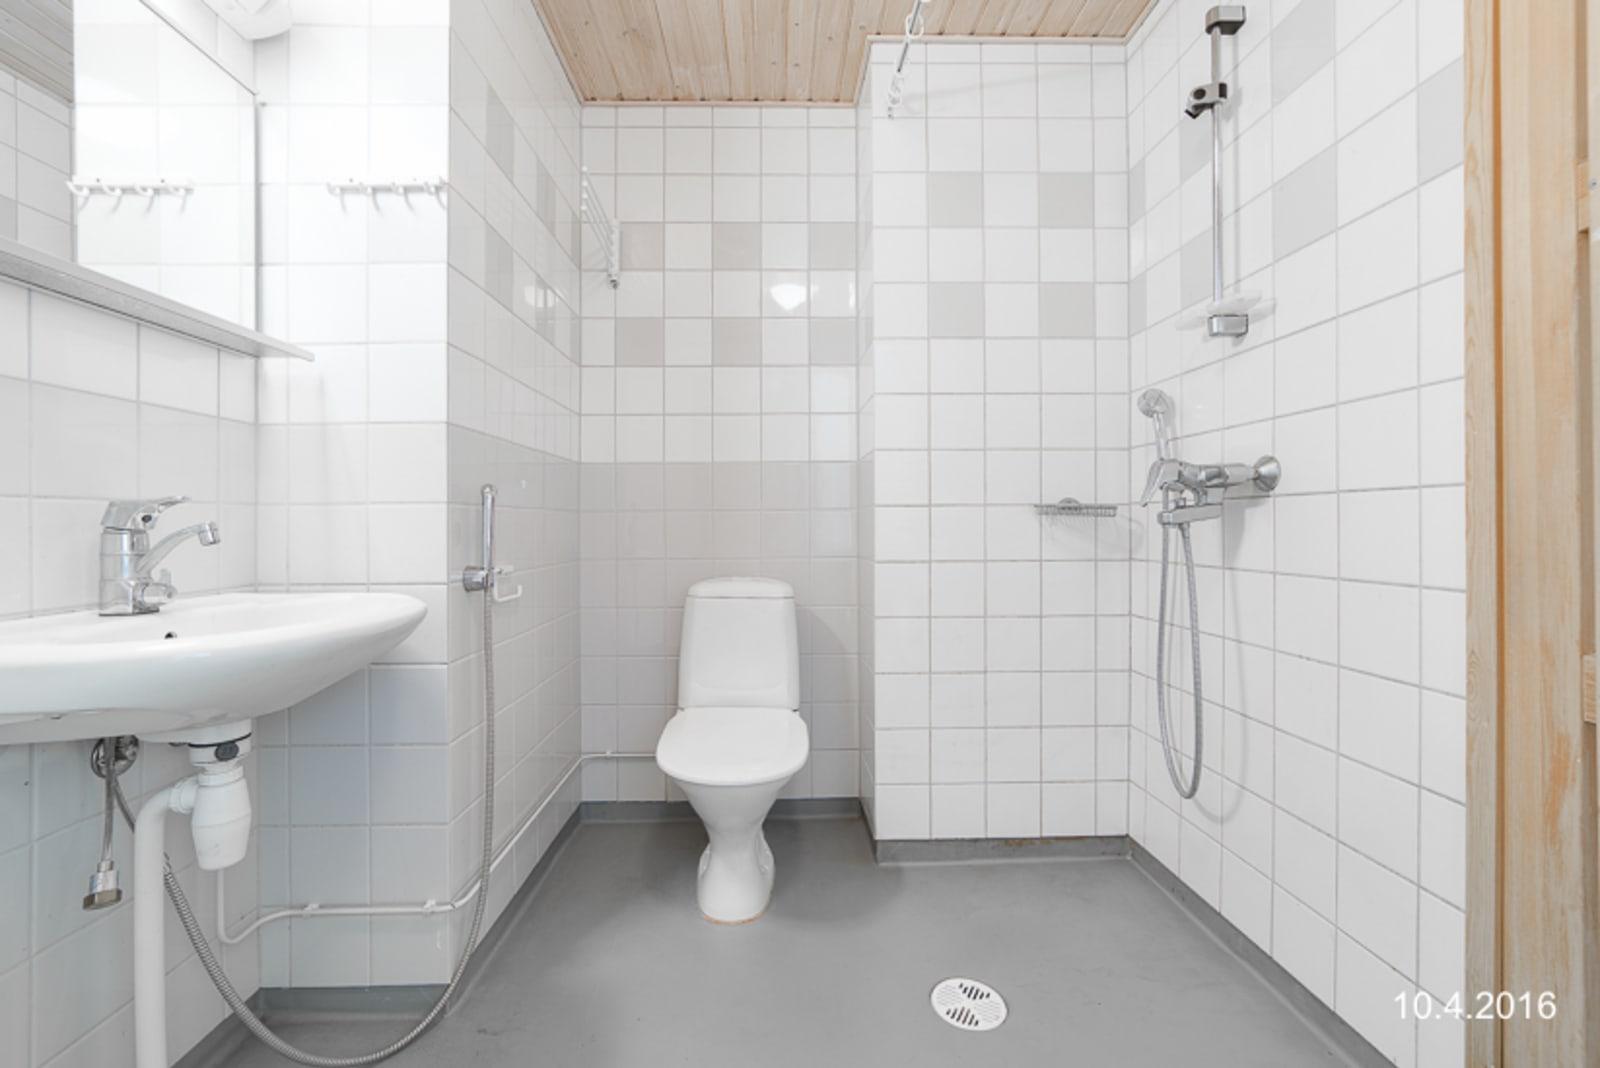 Turku, Itäharju, Ruukinkatu 1 a B 063